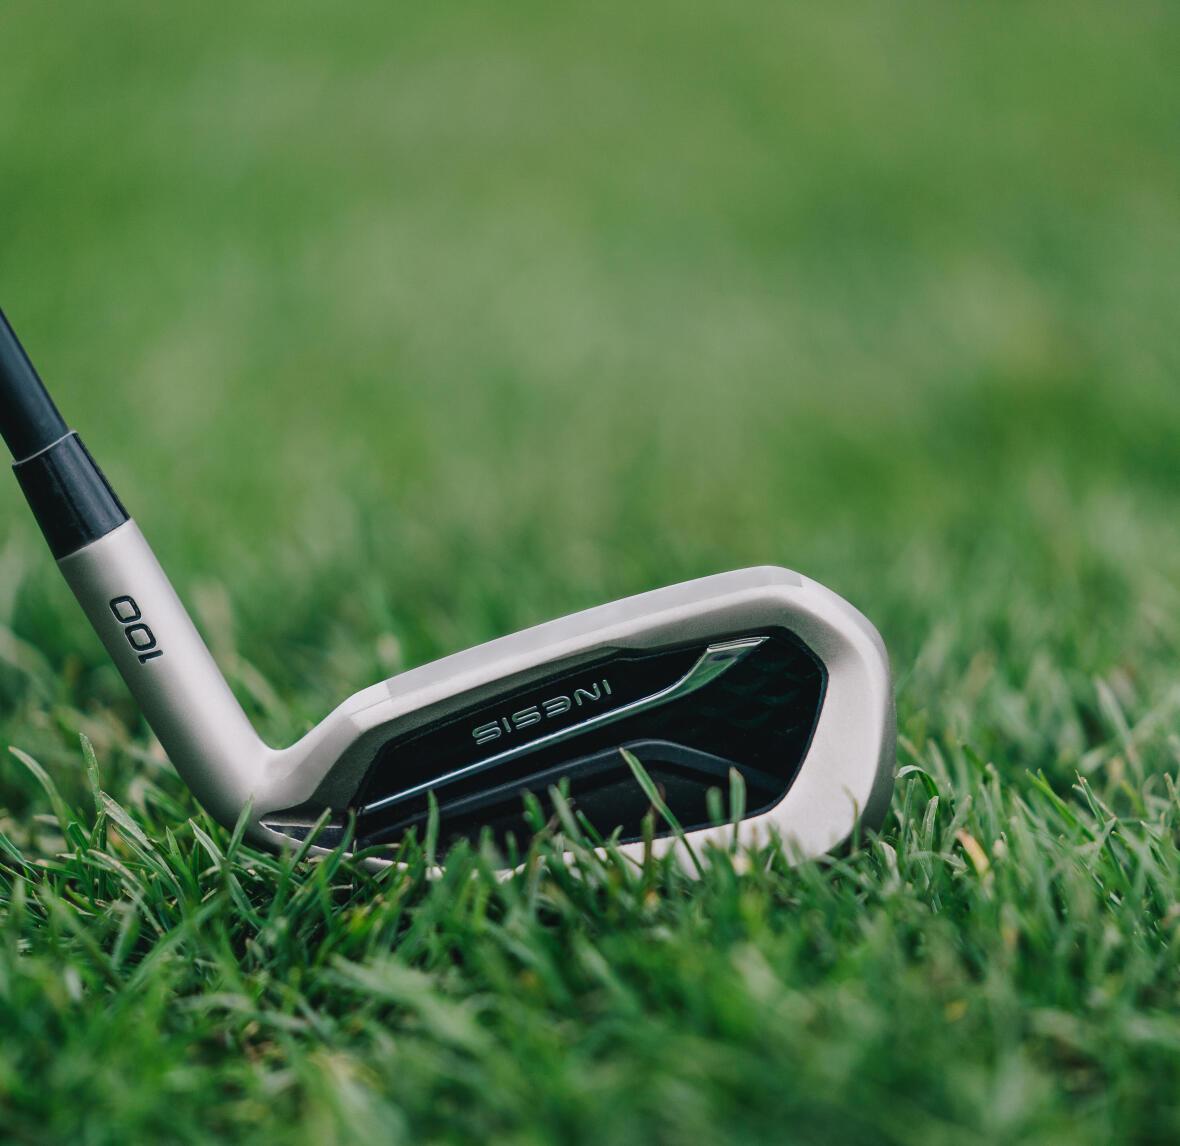 Iron club on a golf course